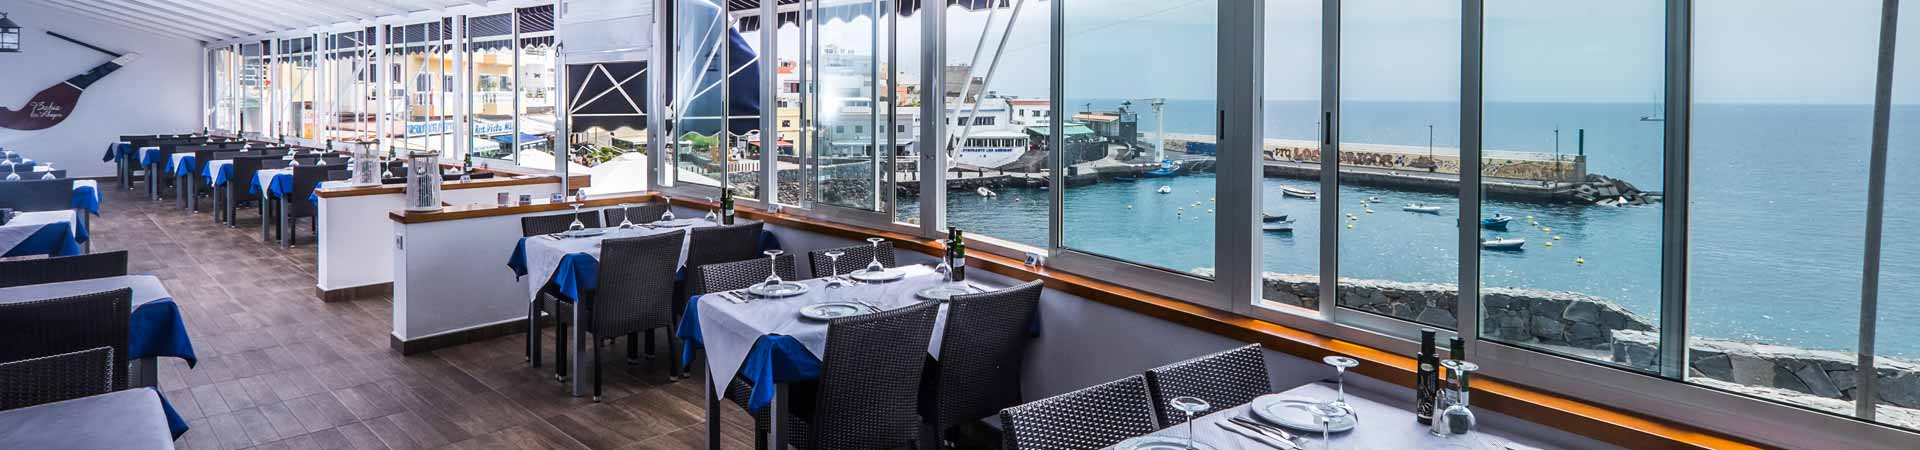 https://www.goodmorningtenerife.com/wp-content/uploads/2015/10/01_slide_restaurante-los-abrigos-1920x450-1.jpg